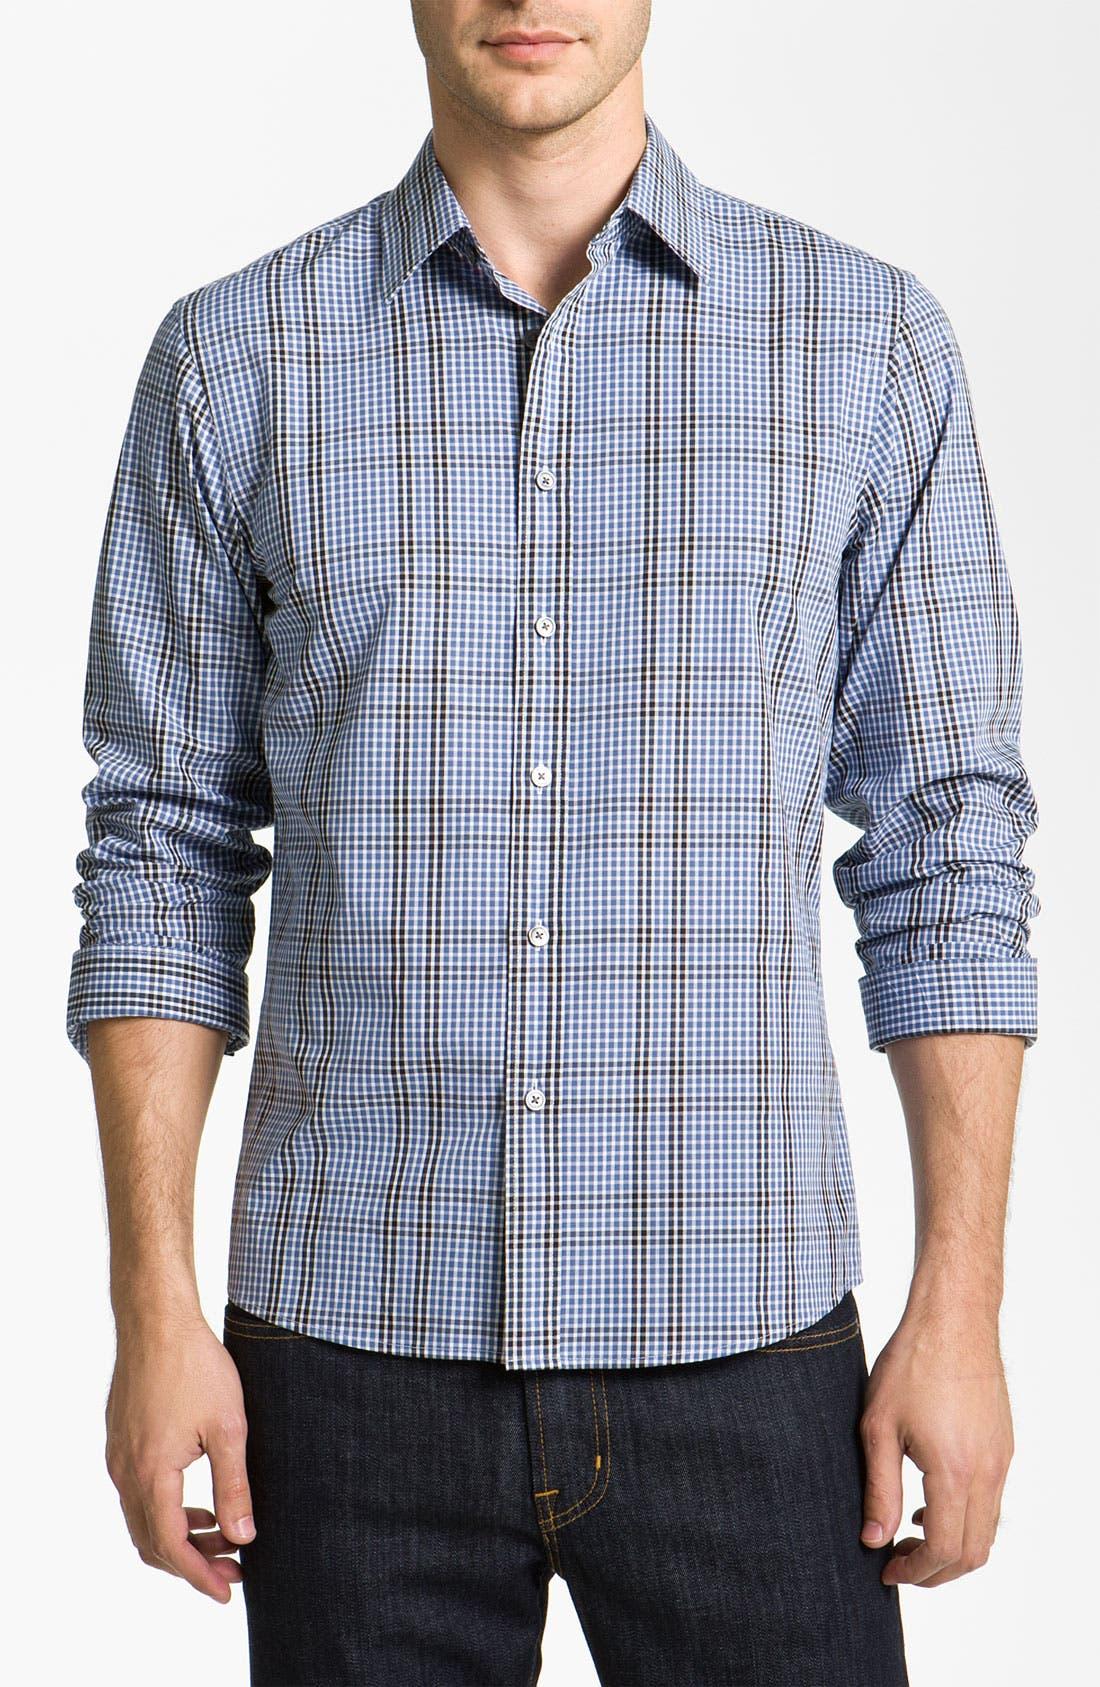 Alternate Image 1 Selected - Michael Kors 'Spalding' Check Woven Shirt